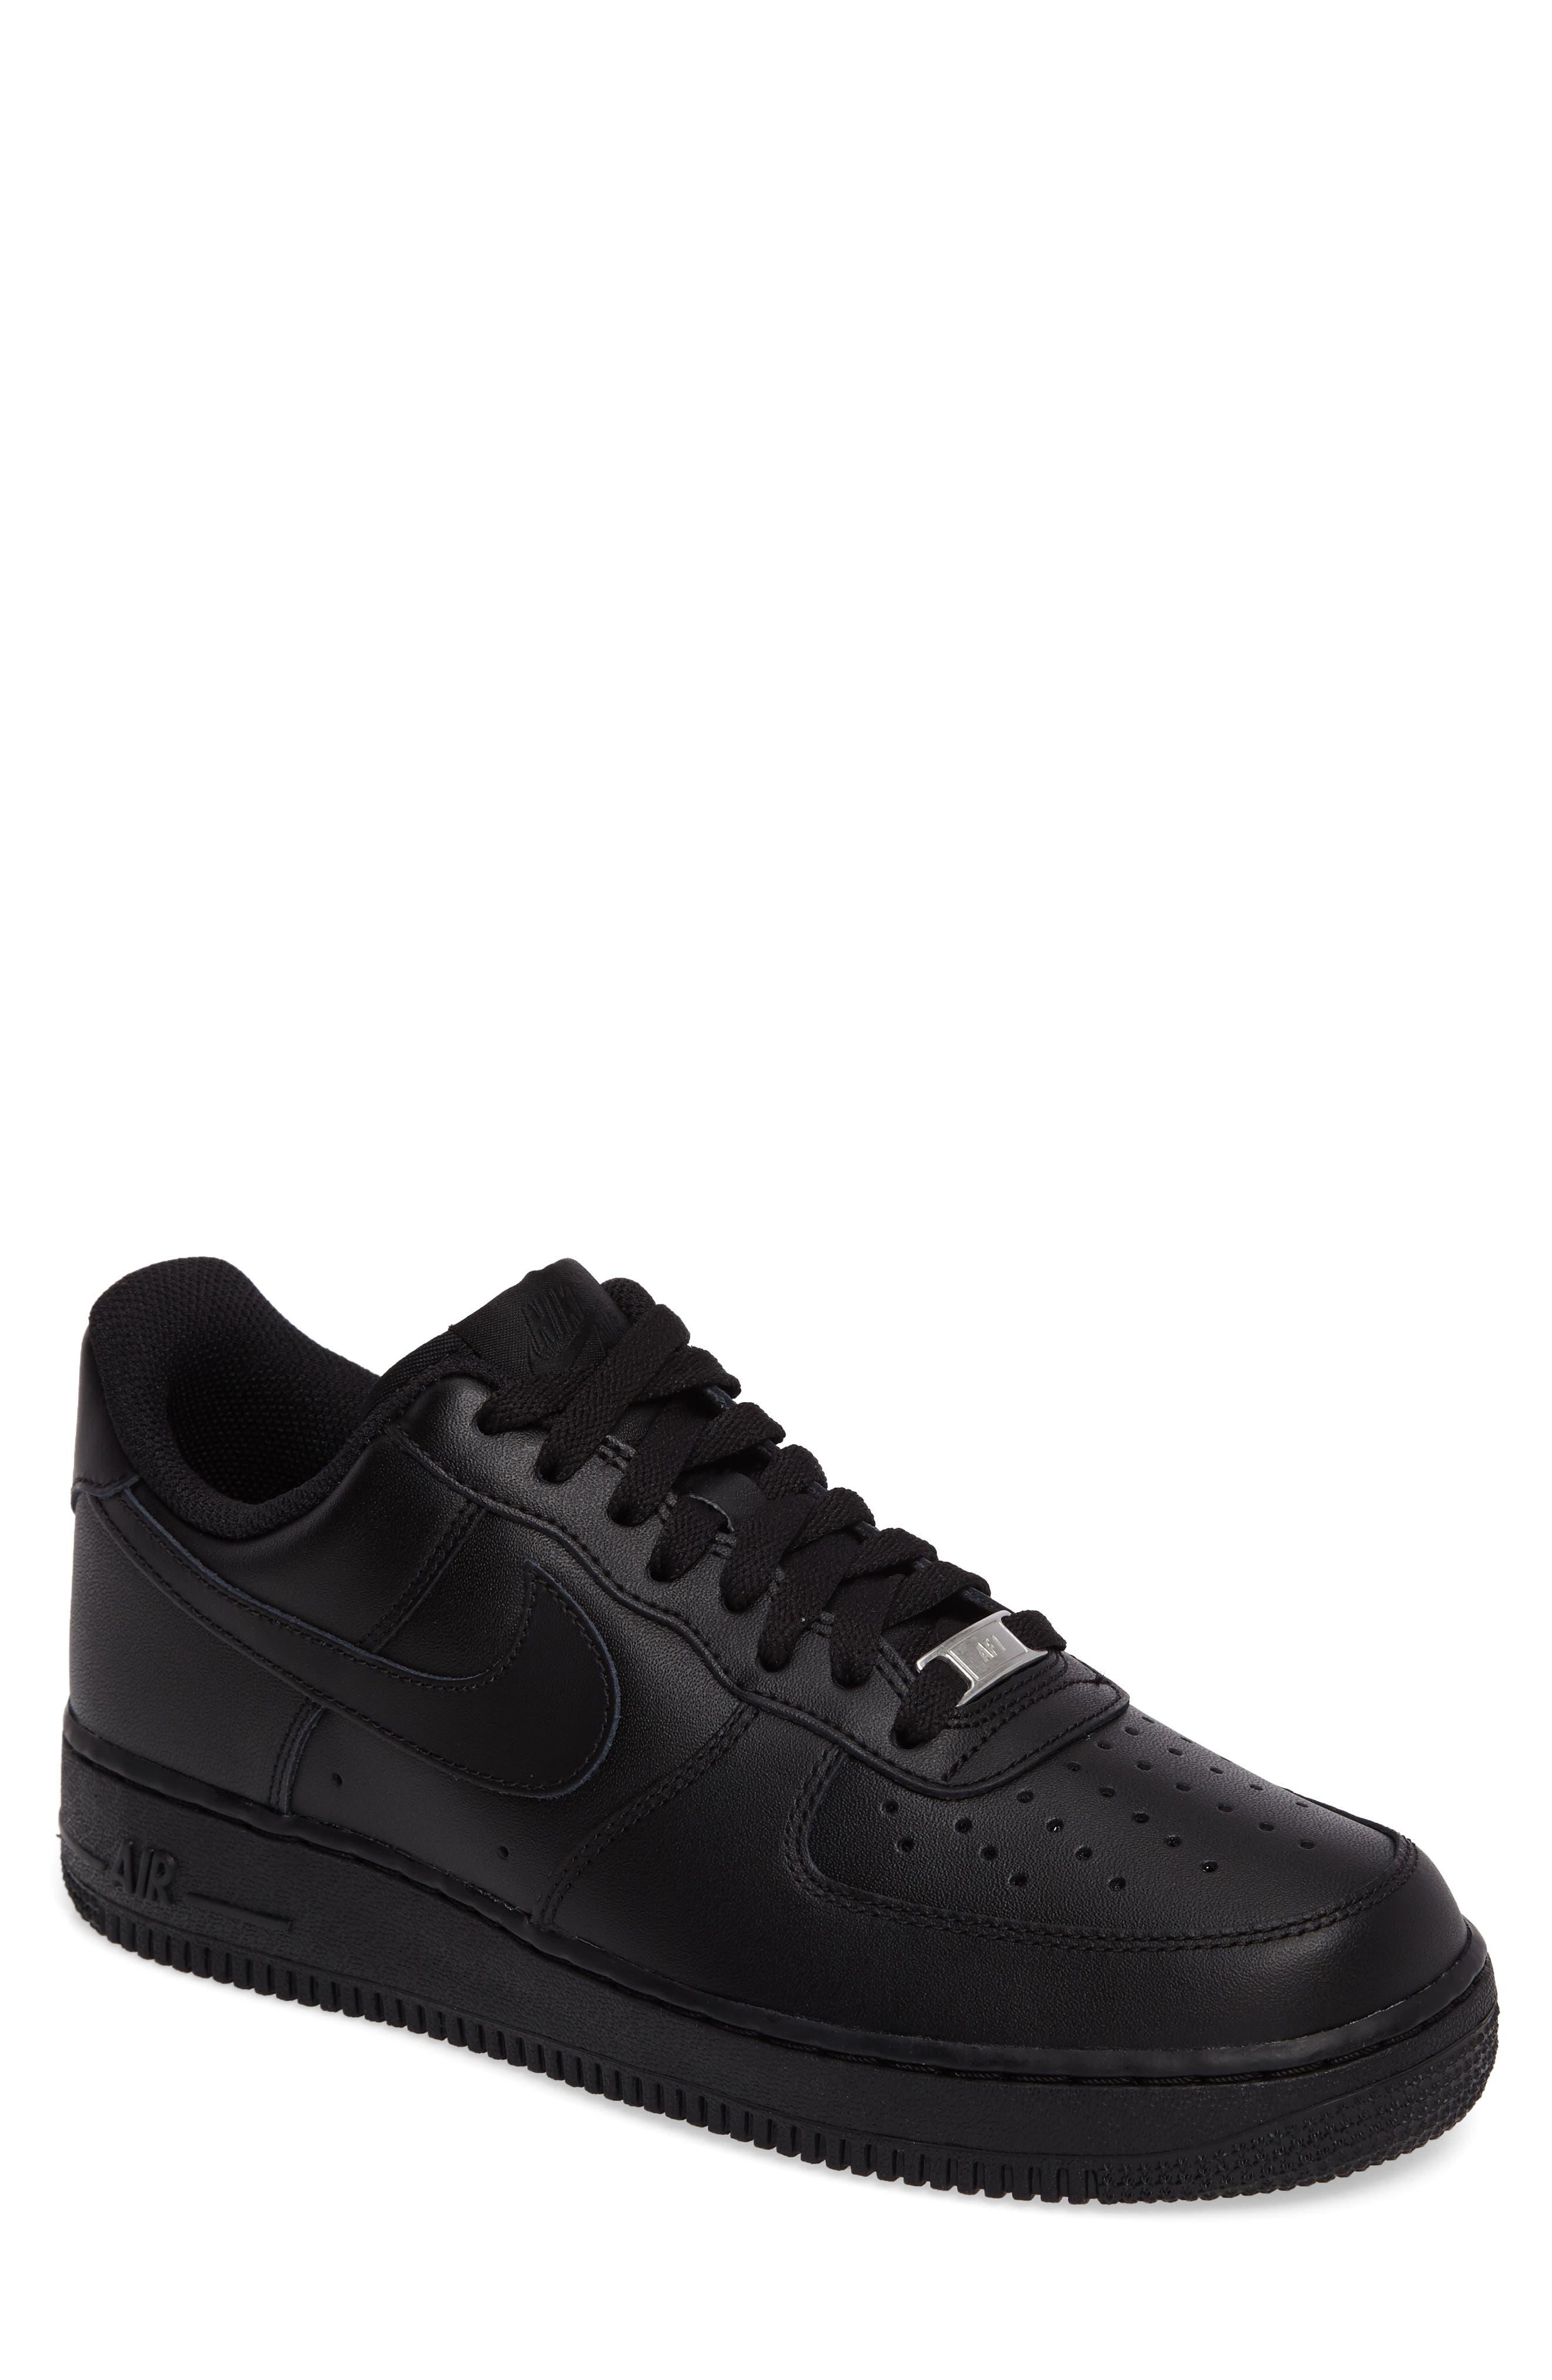 NIKE, Air Force 1 '07 Sneaker, Main thumbnail 1, color, BLACK/ BLACK